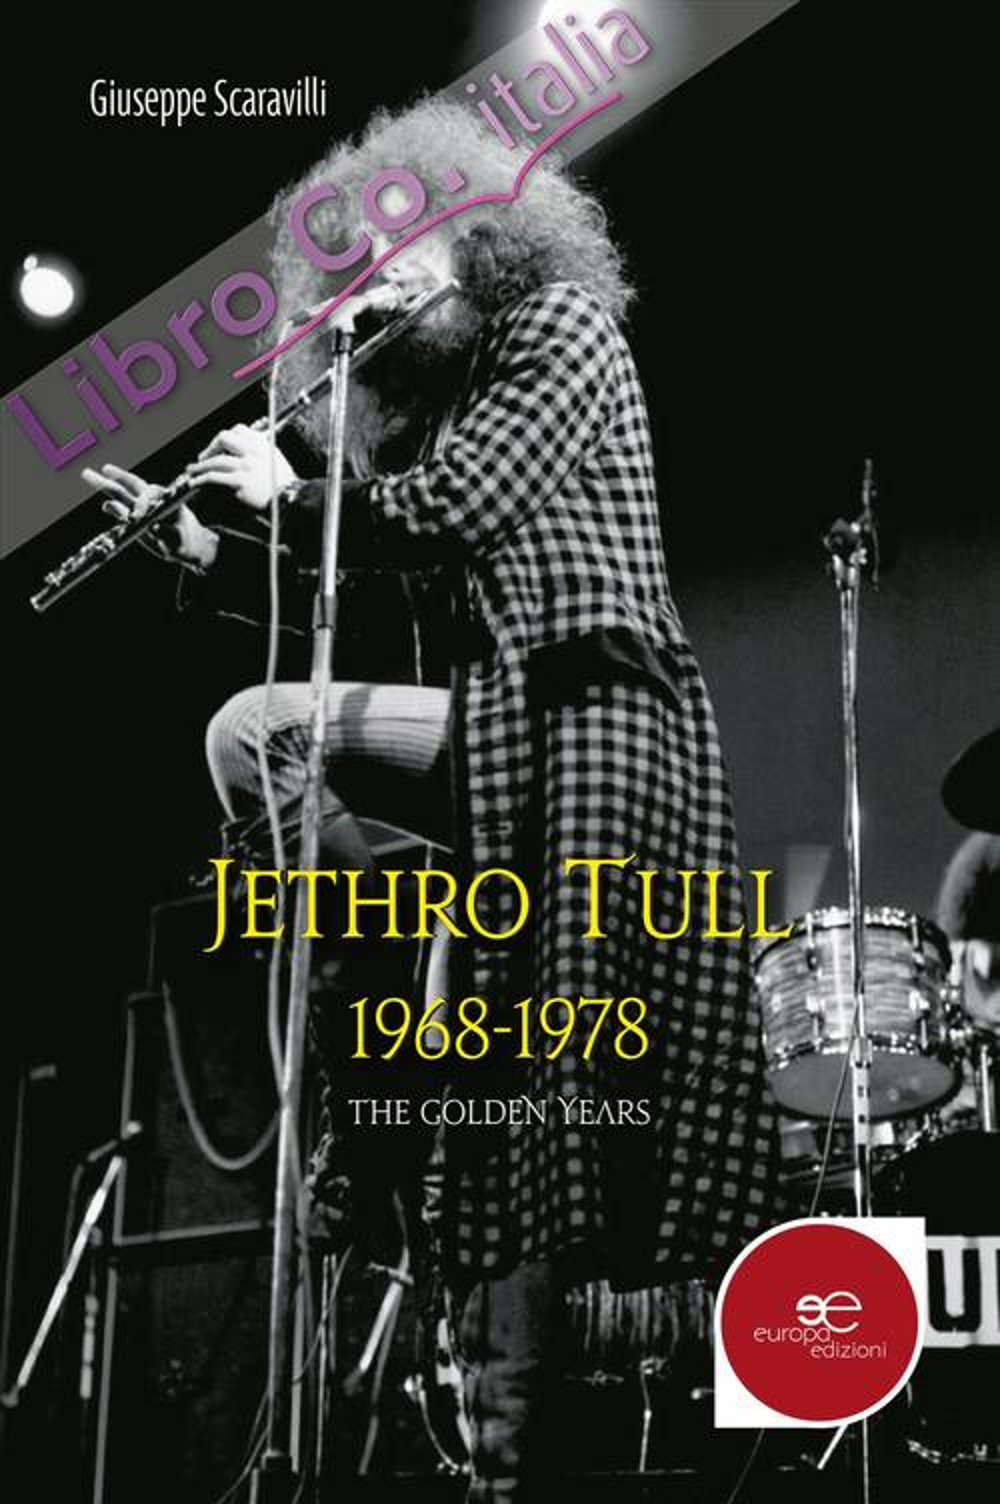 Jethro Tull 1968-1978. The golden years